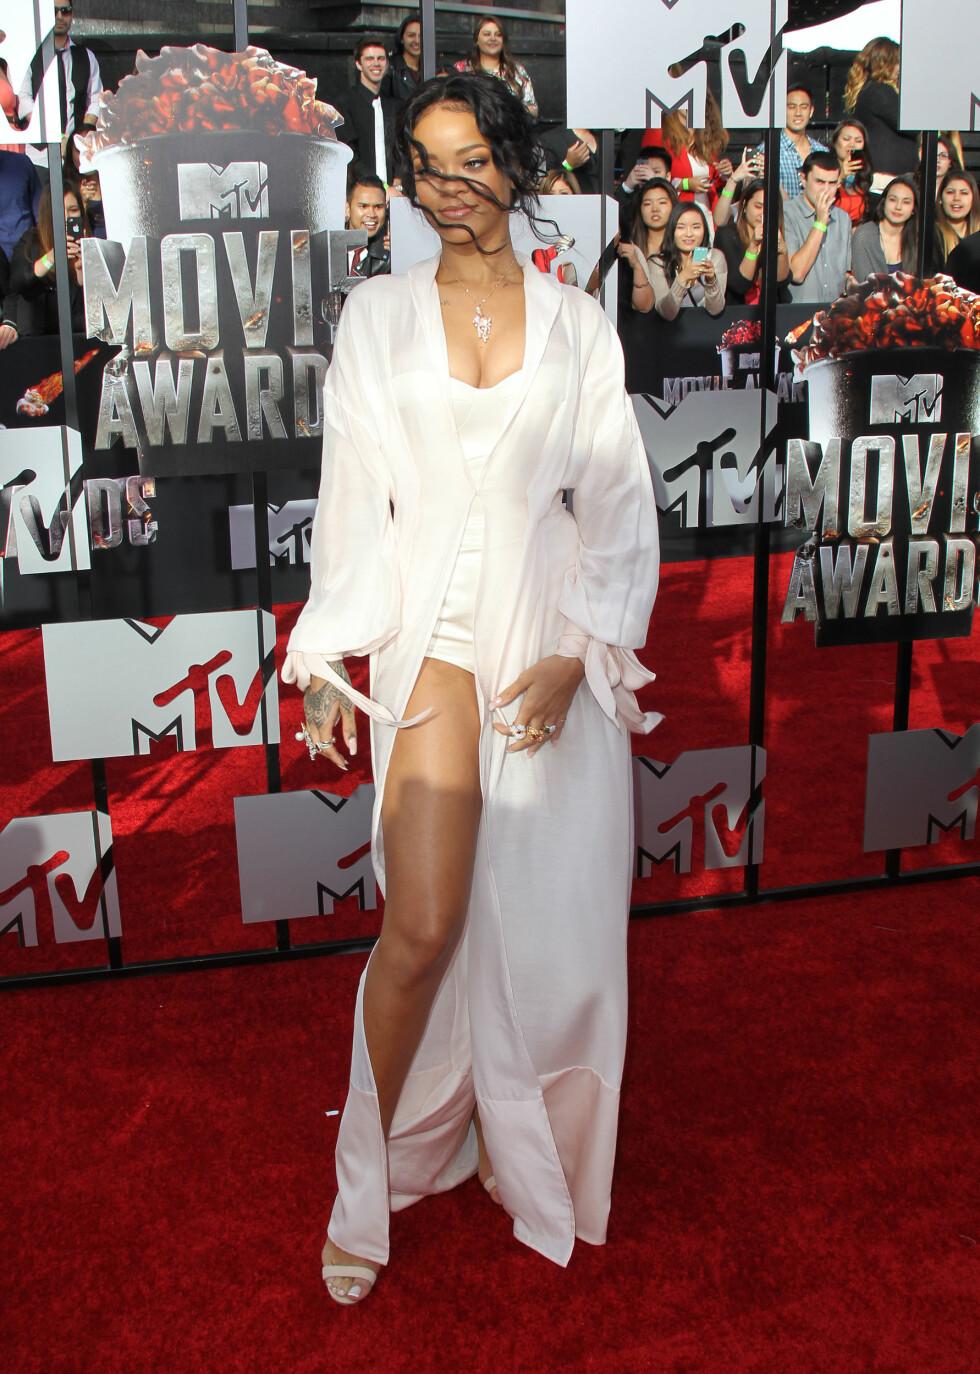 Rihanna Foto: Jen Lowery / Splash News/ All Over Press